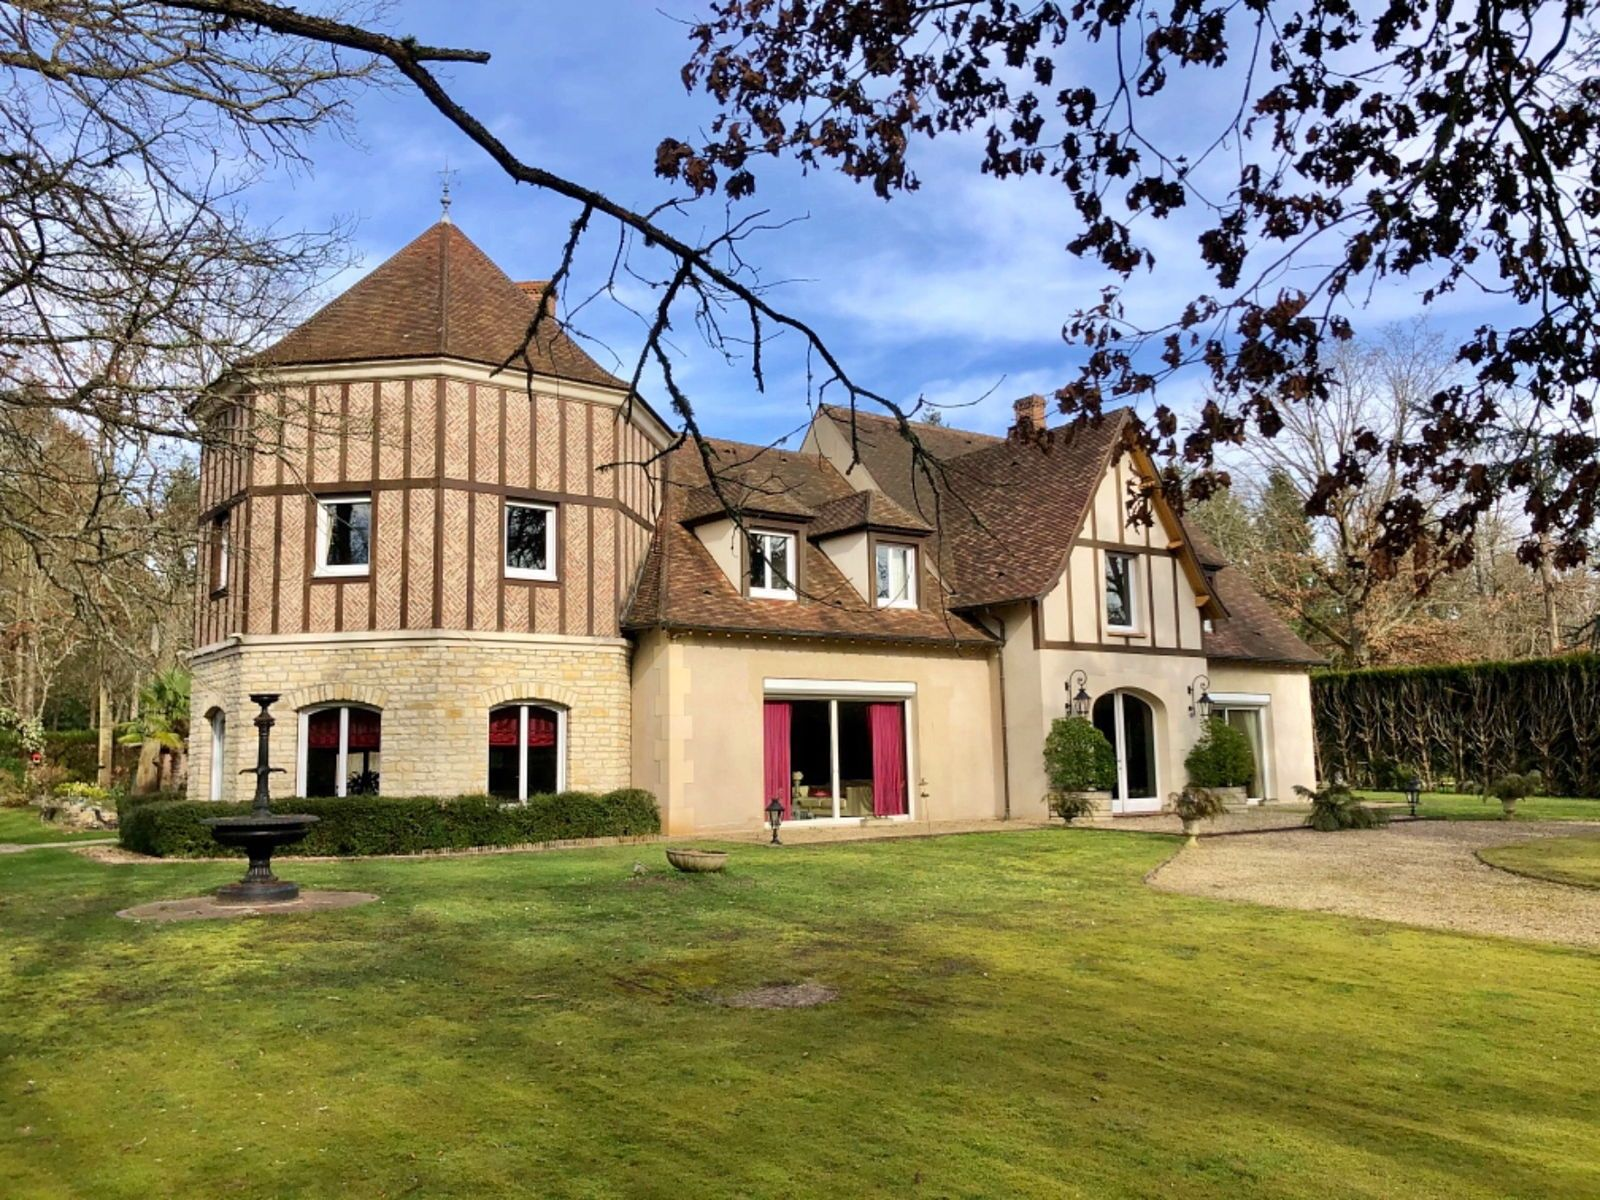 Vends Chantilly-Lamorlaye Manoir Contemporain (60500) - 5chambres, 400m²